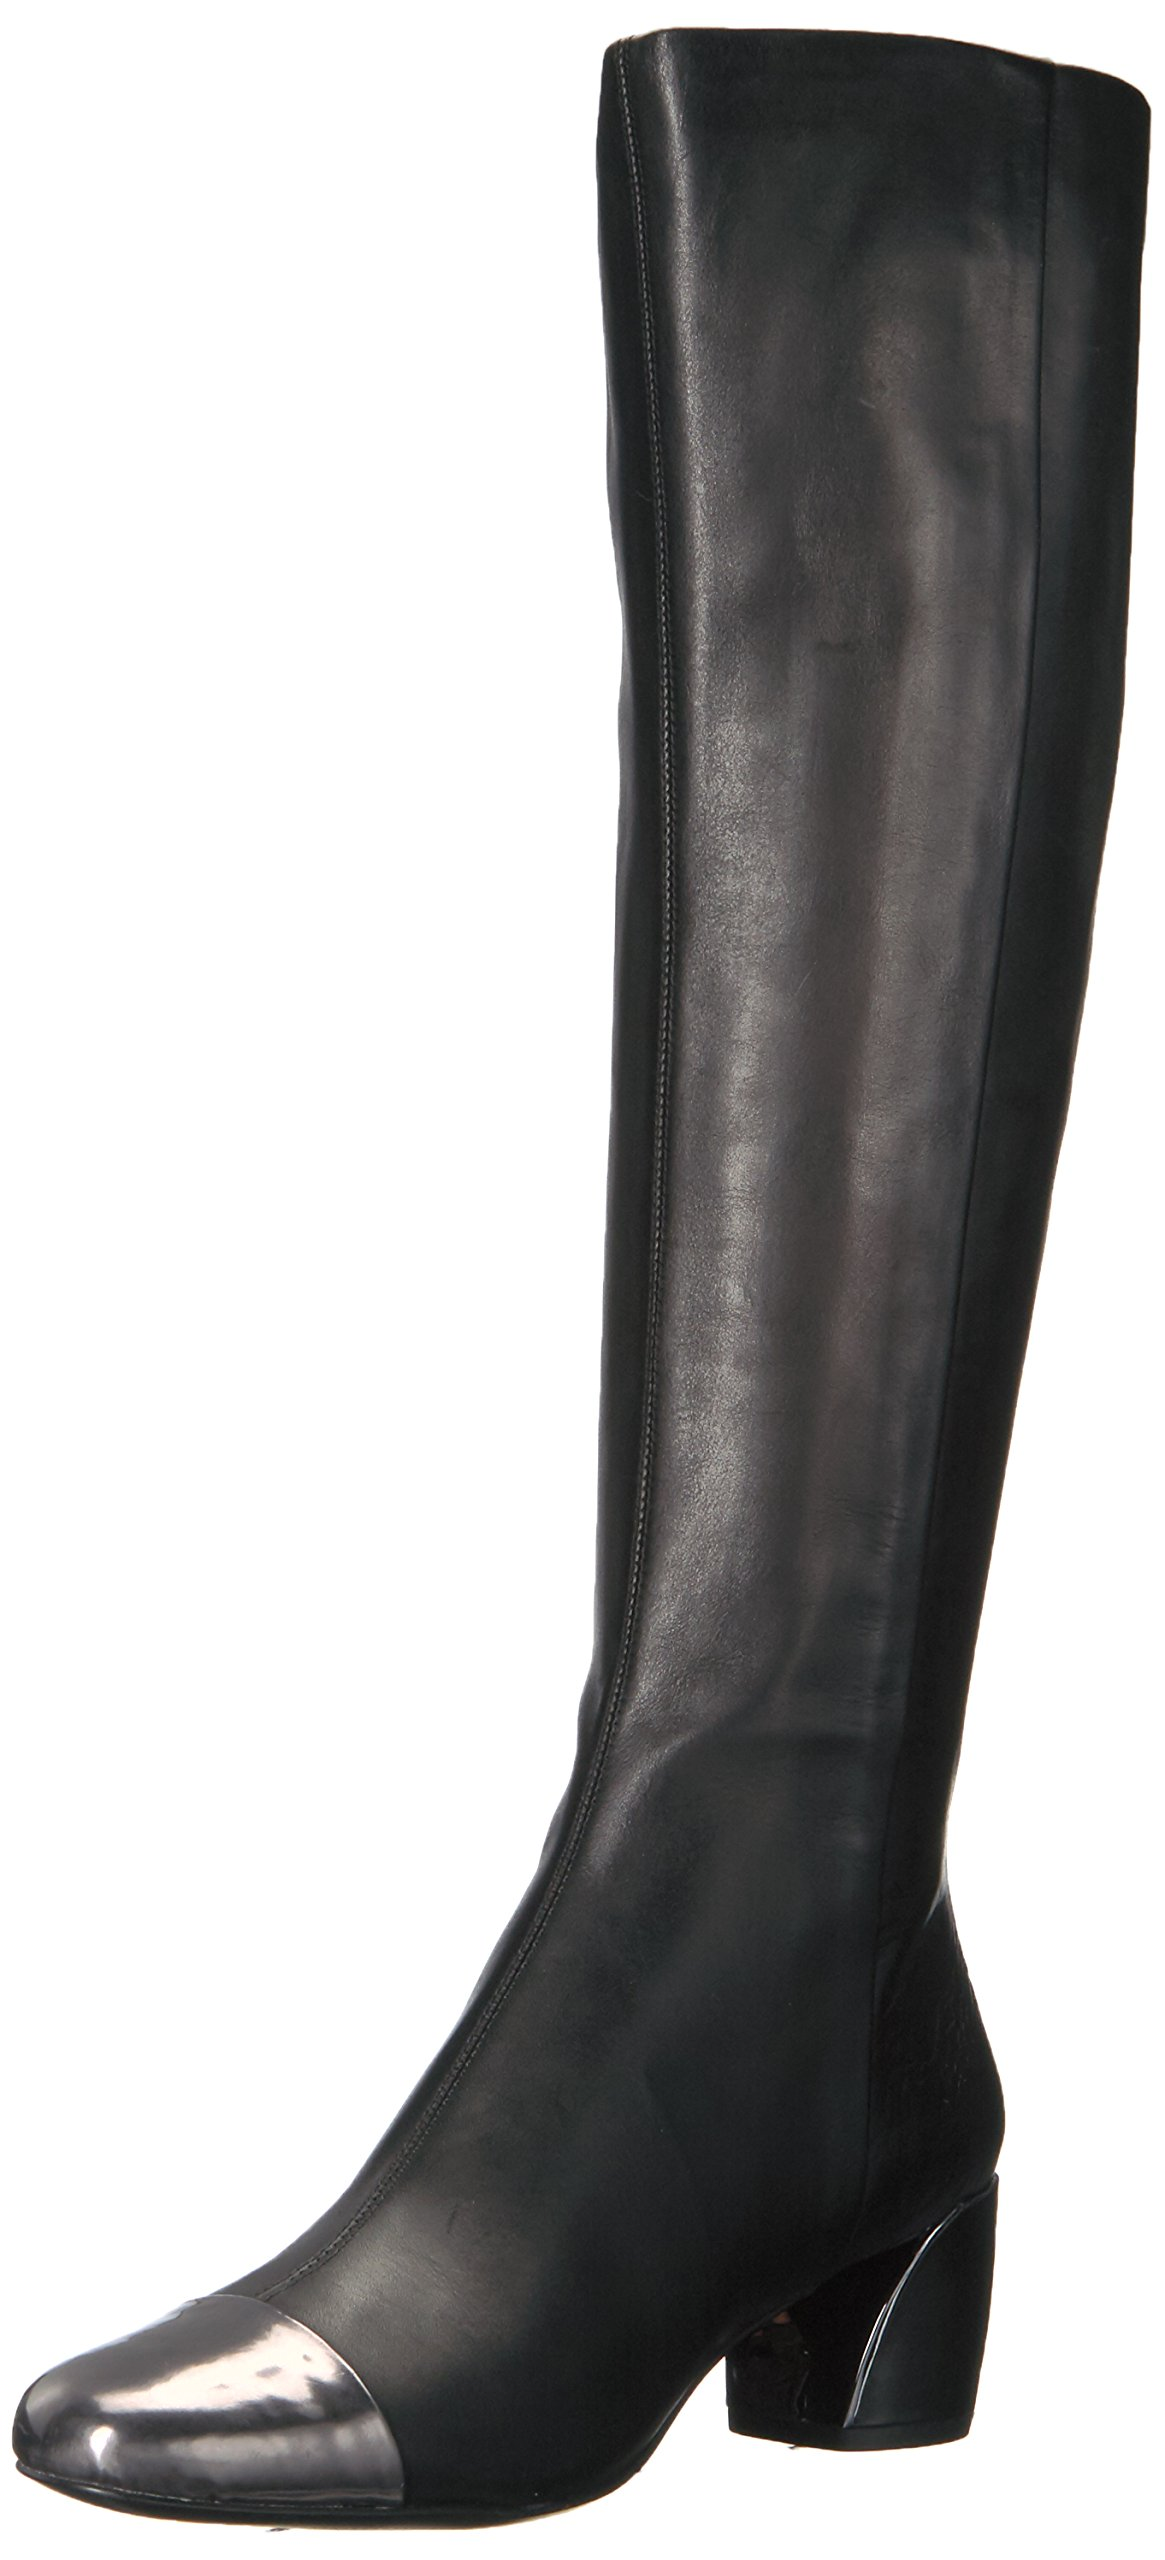 Nine West Women's Jatoba Knee High Boot, Black/Pewter, 8 Medium US